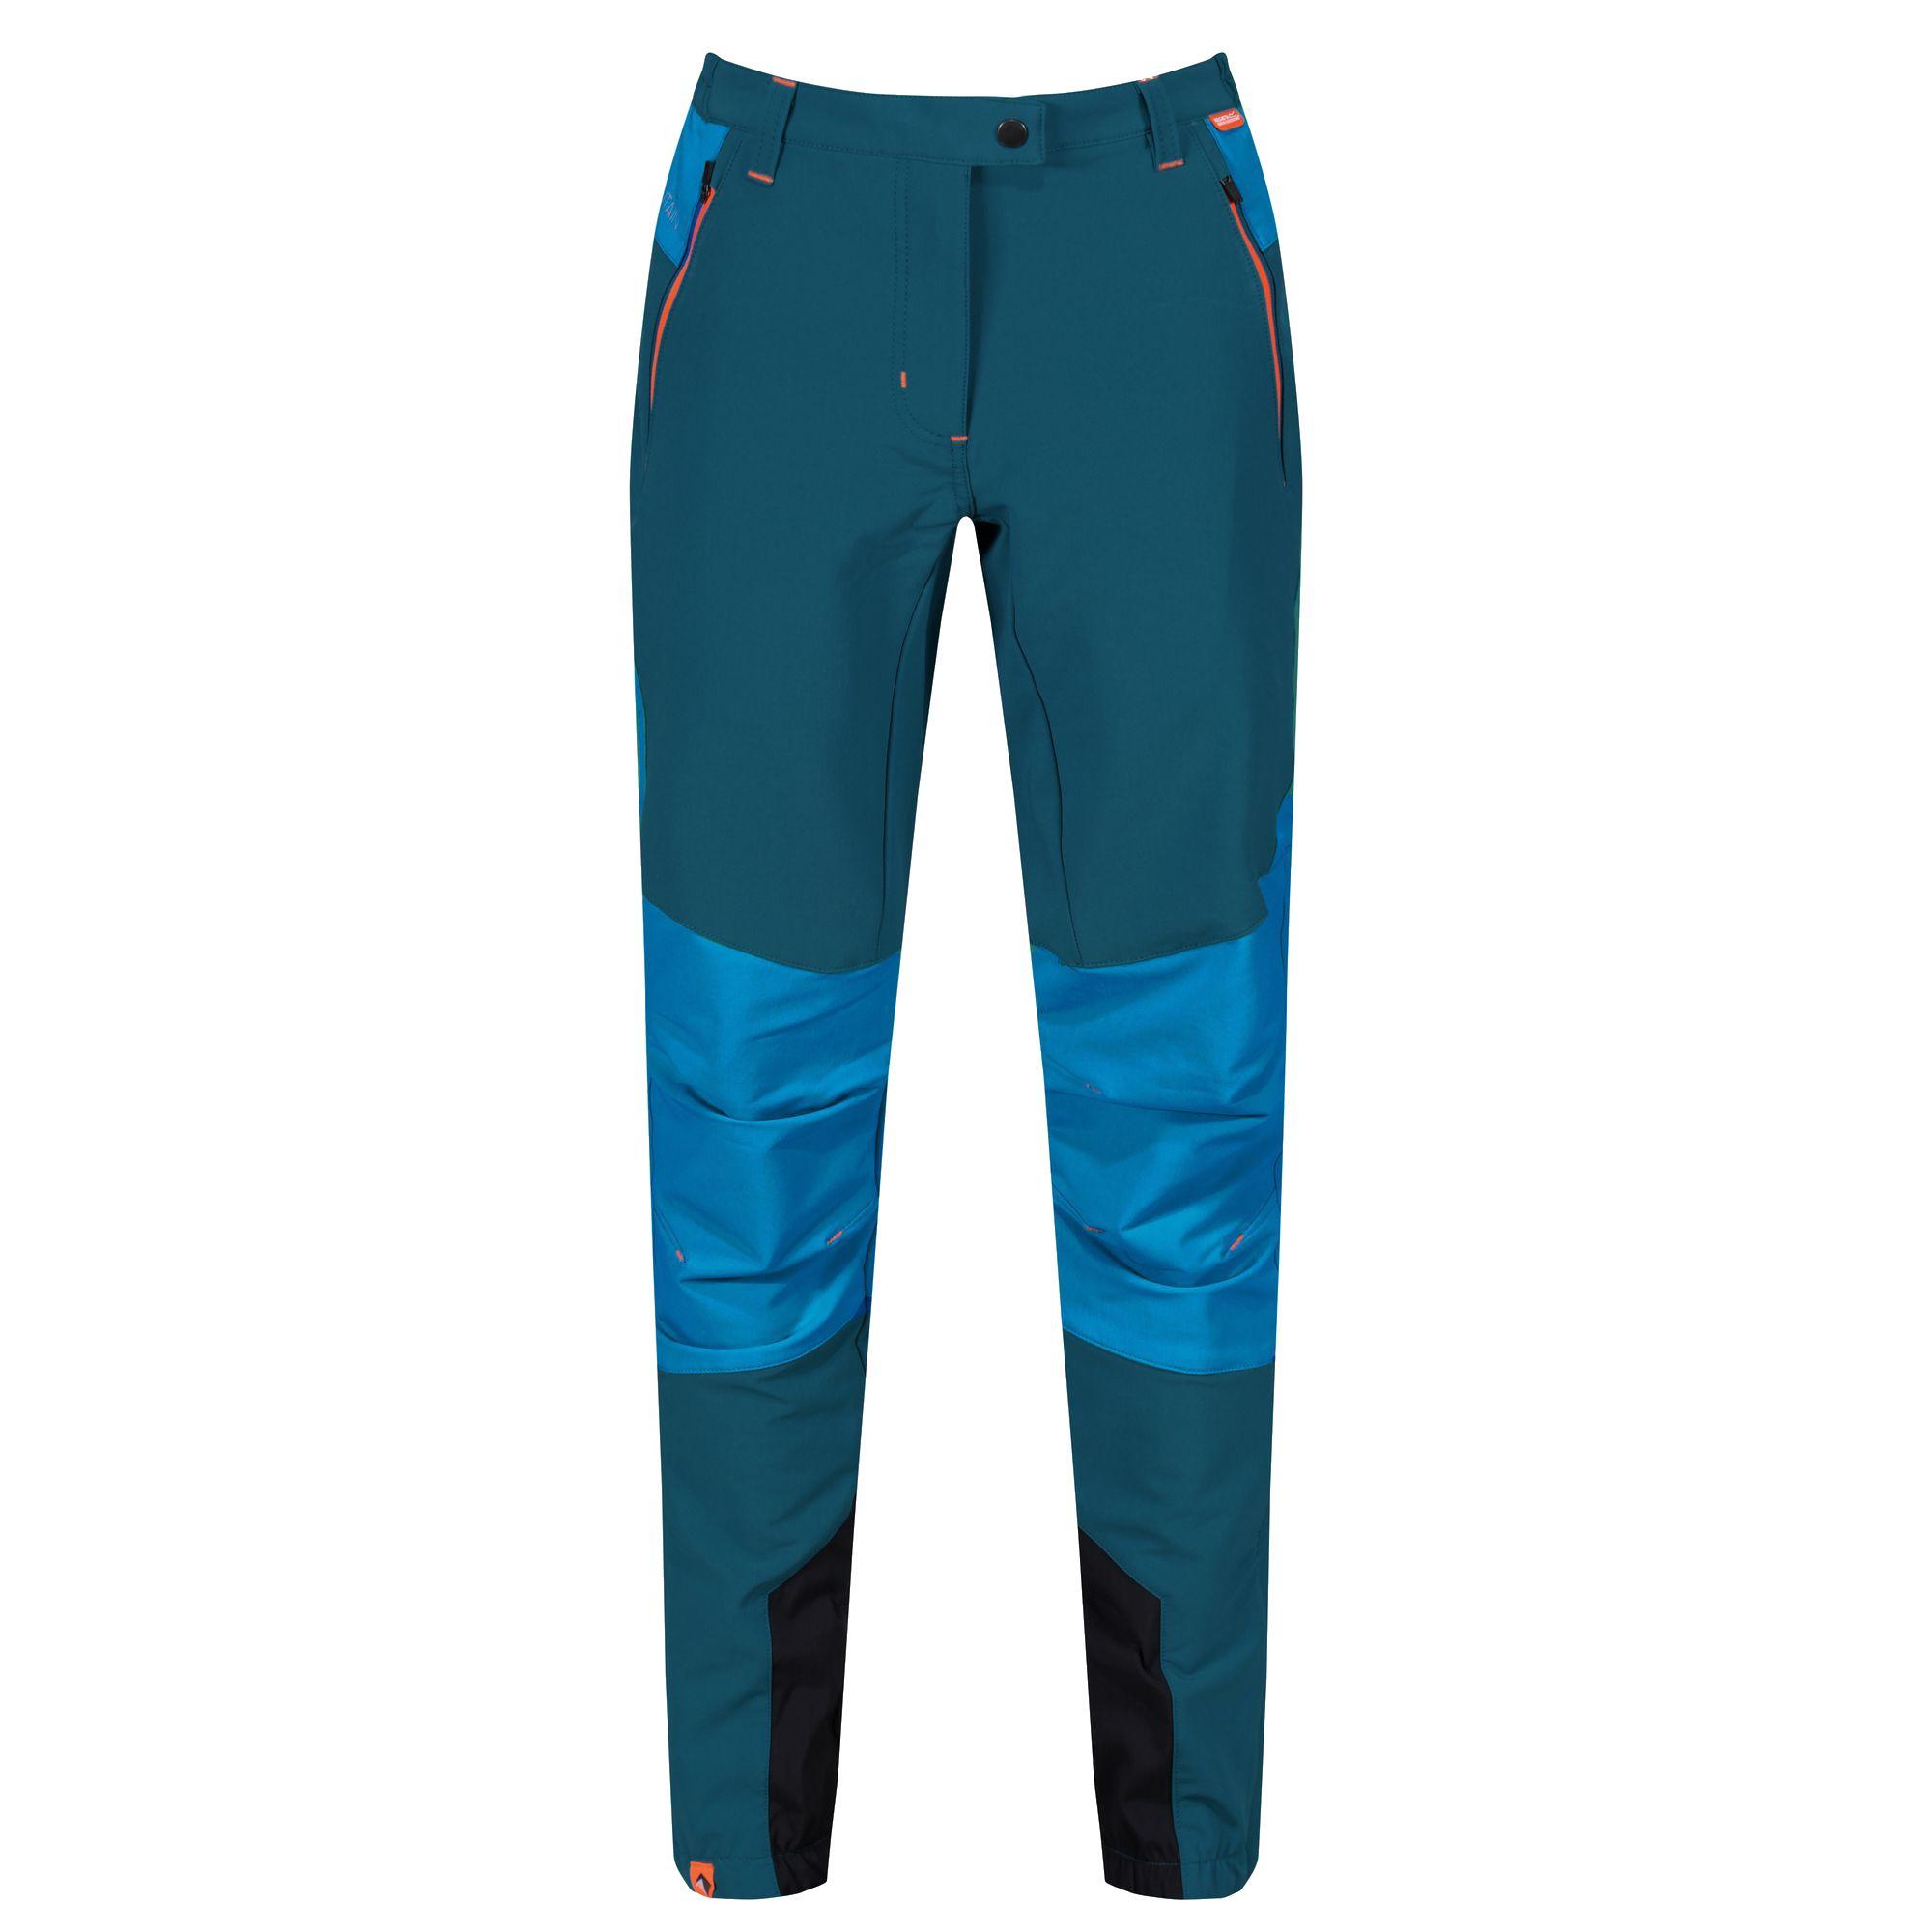 Regatta Womens/Ladies Water Repellent Trousers